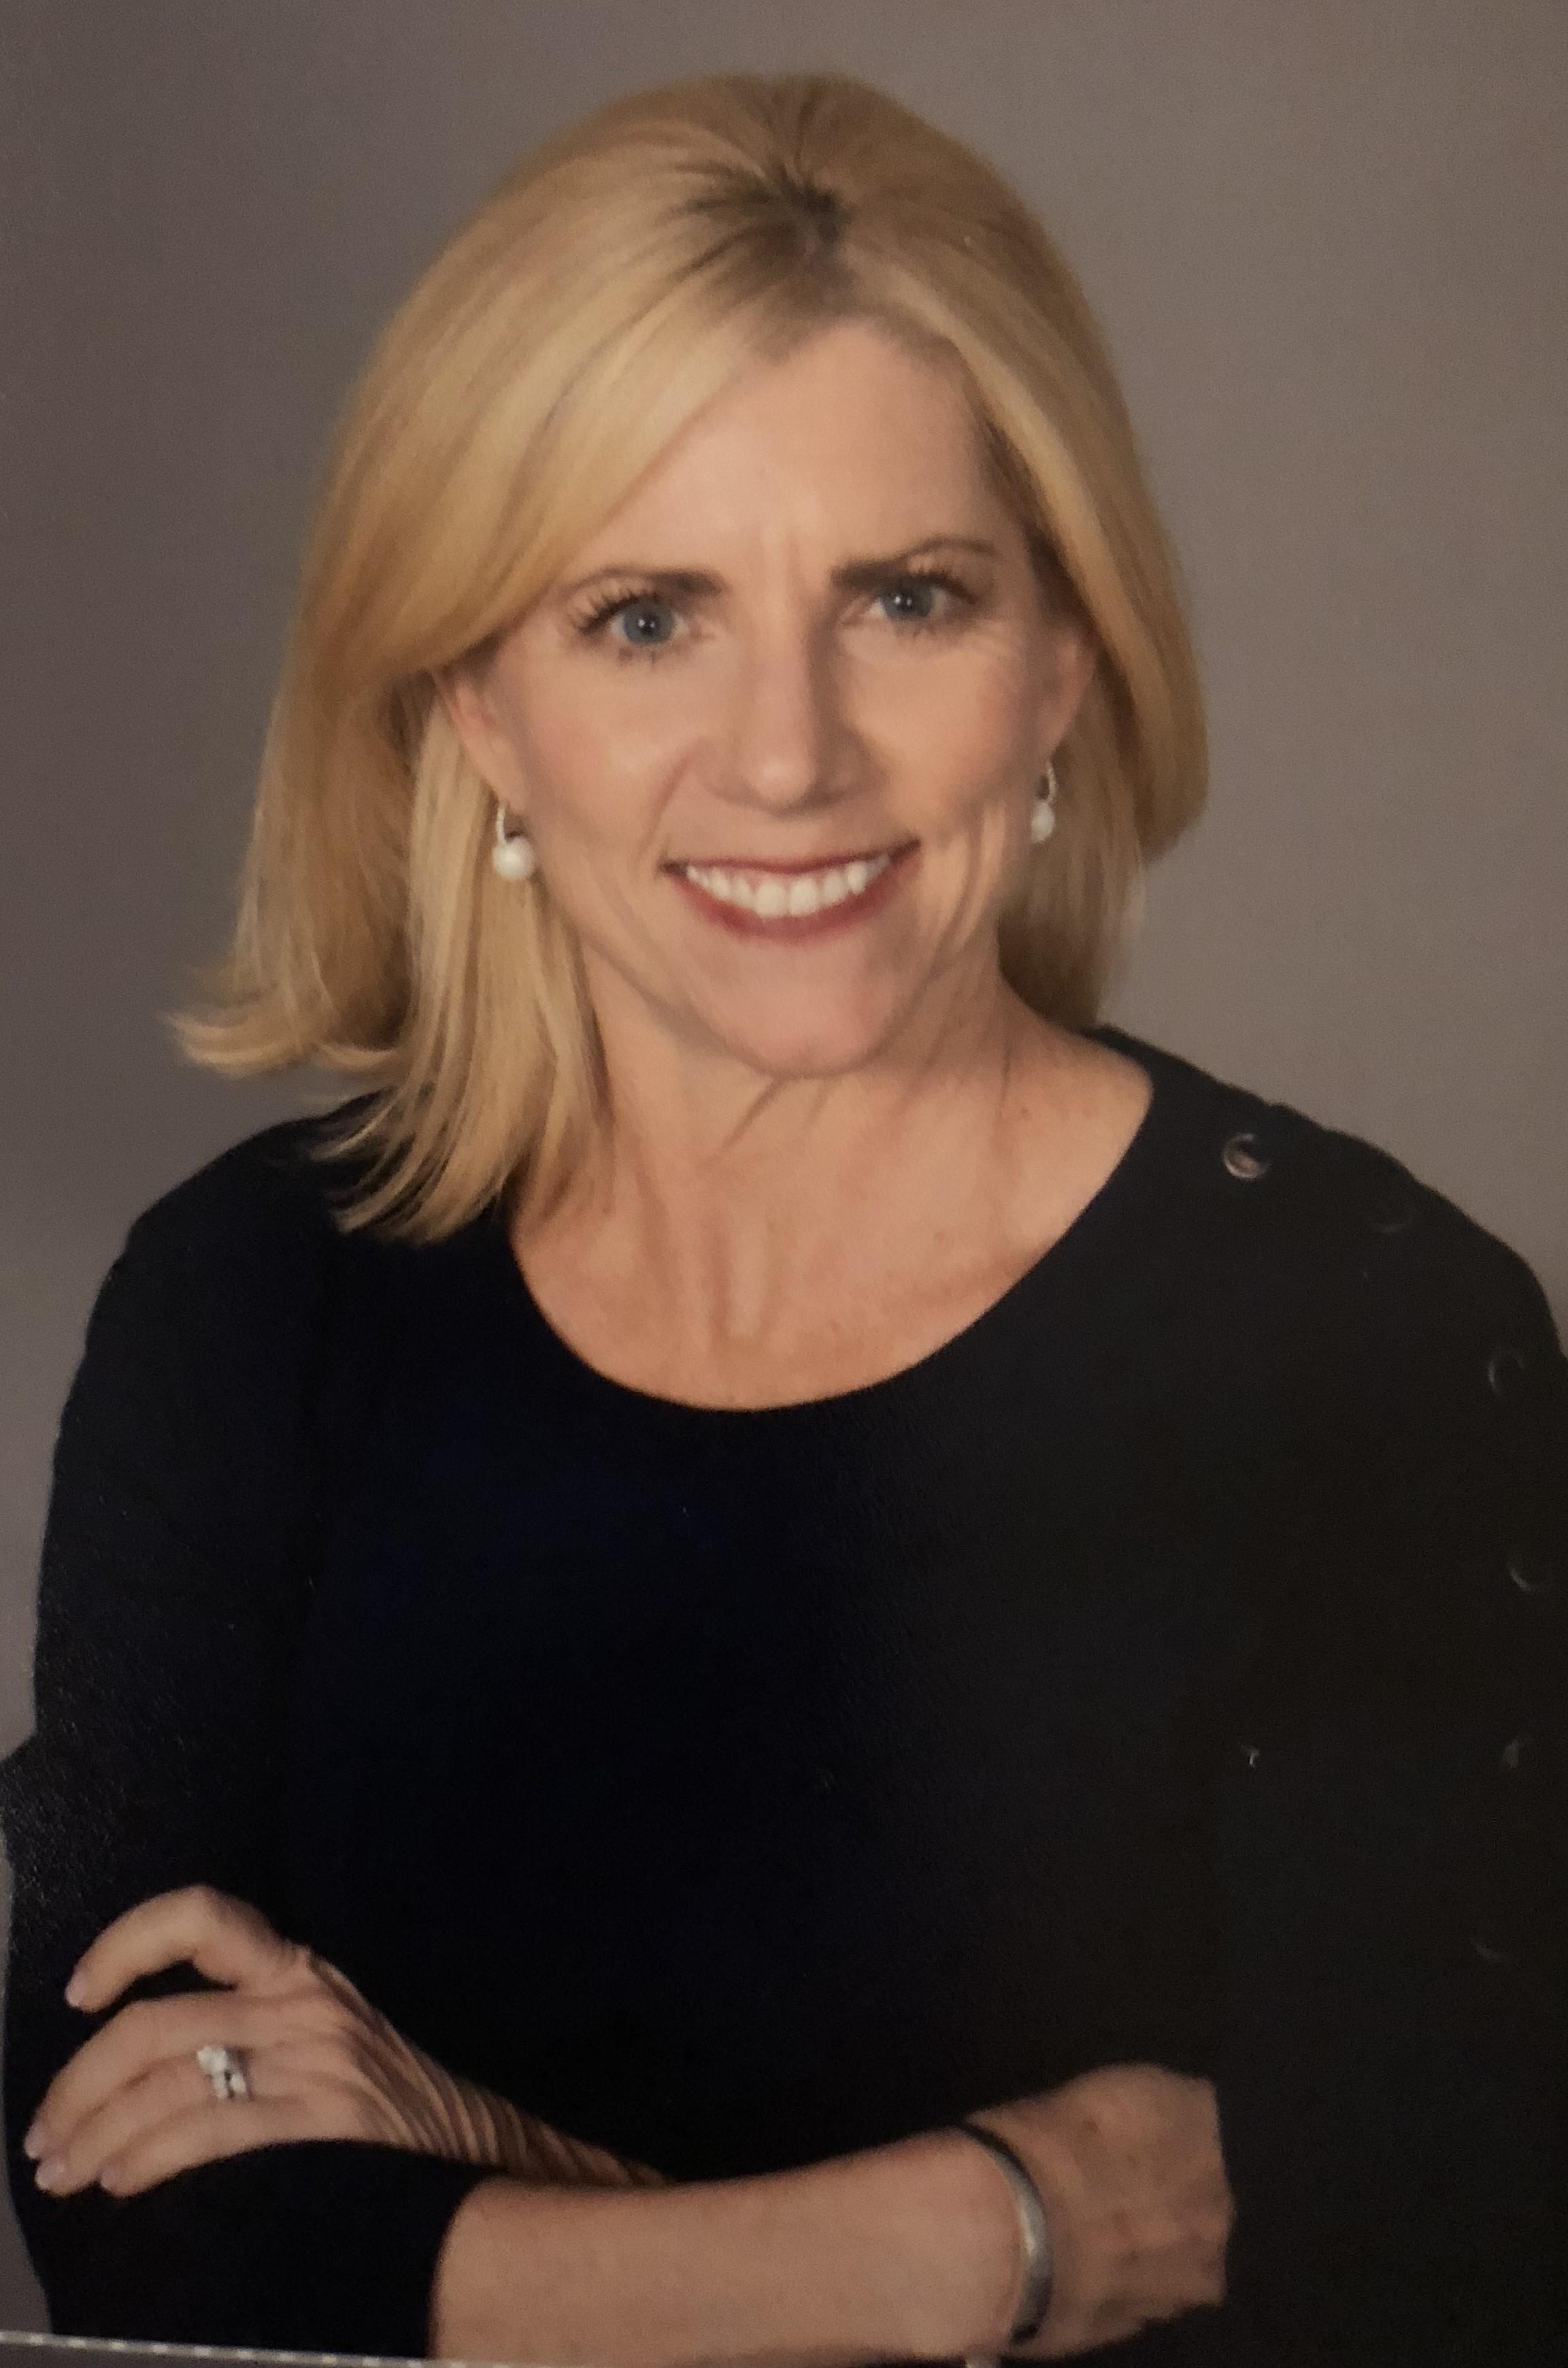 Colleen McHugh